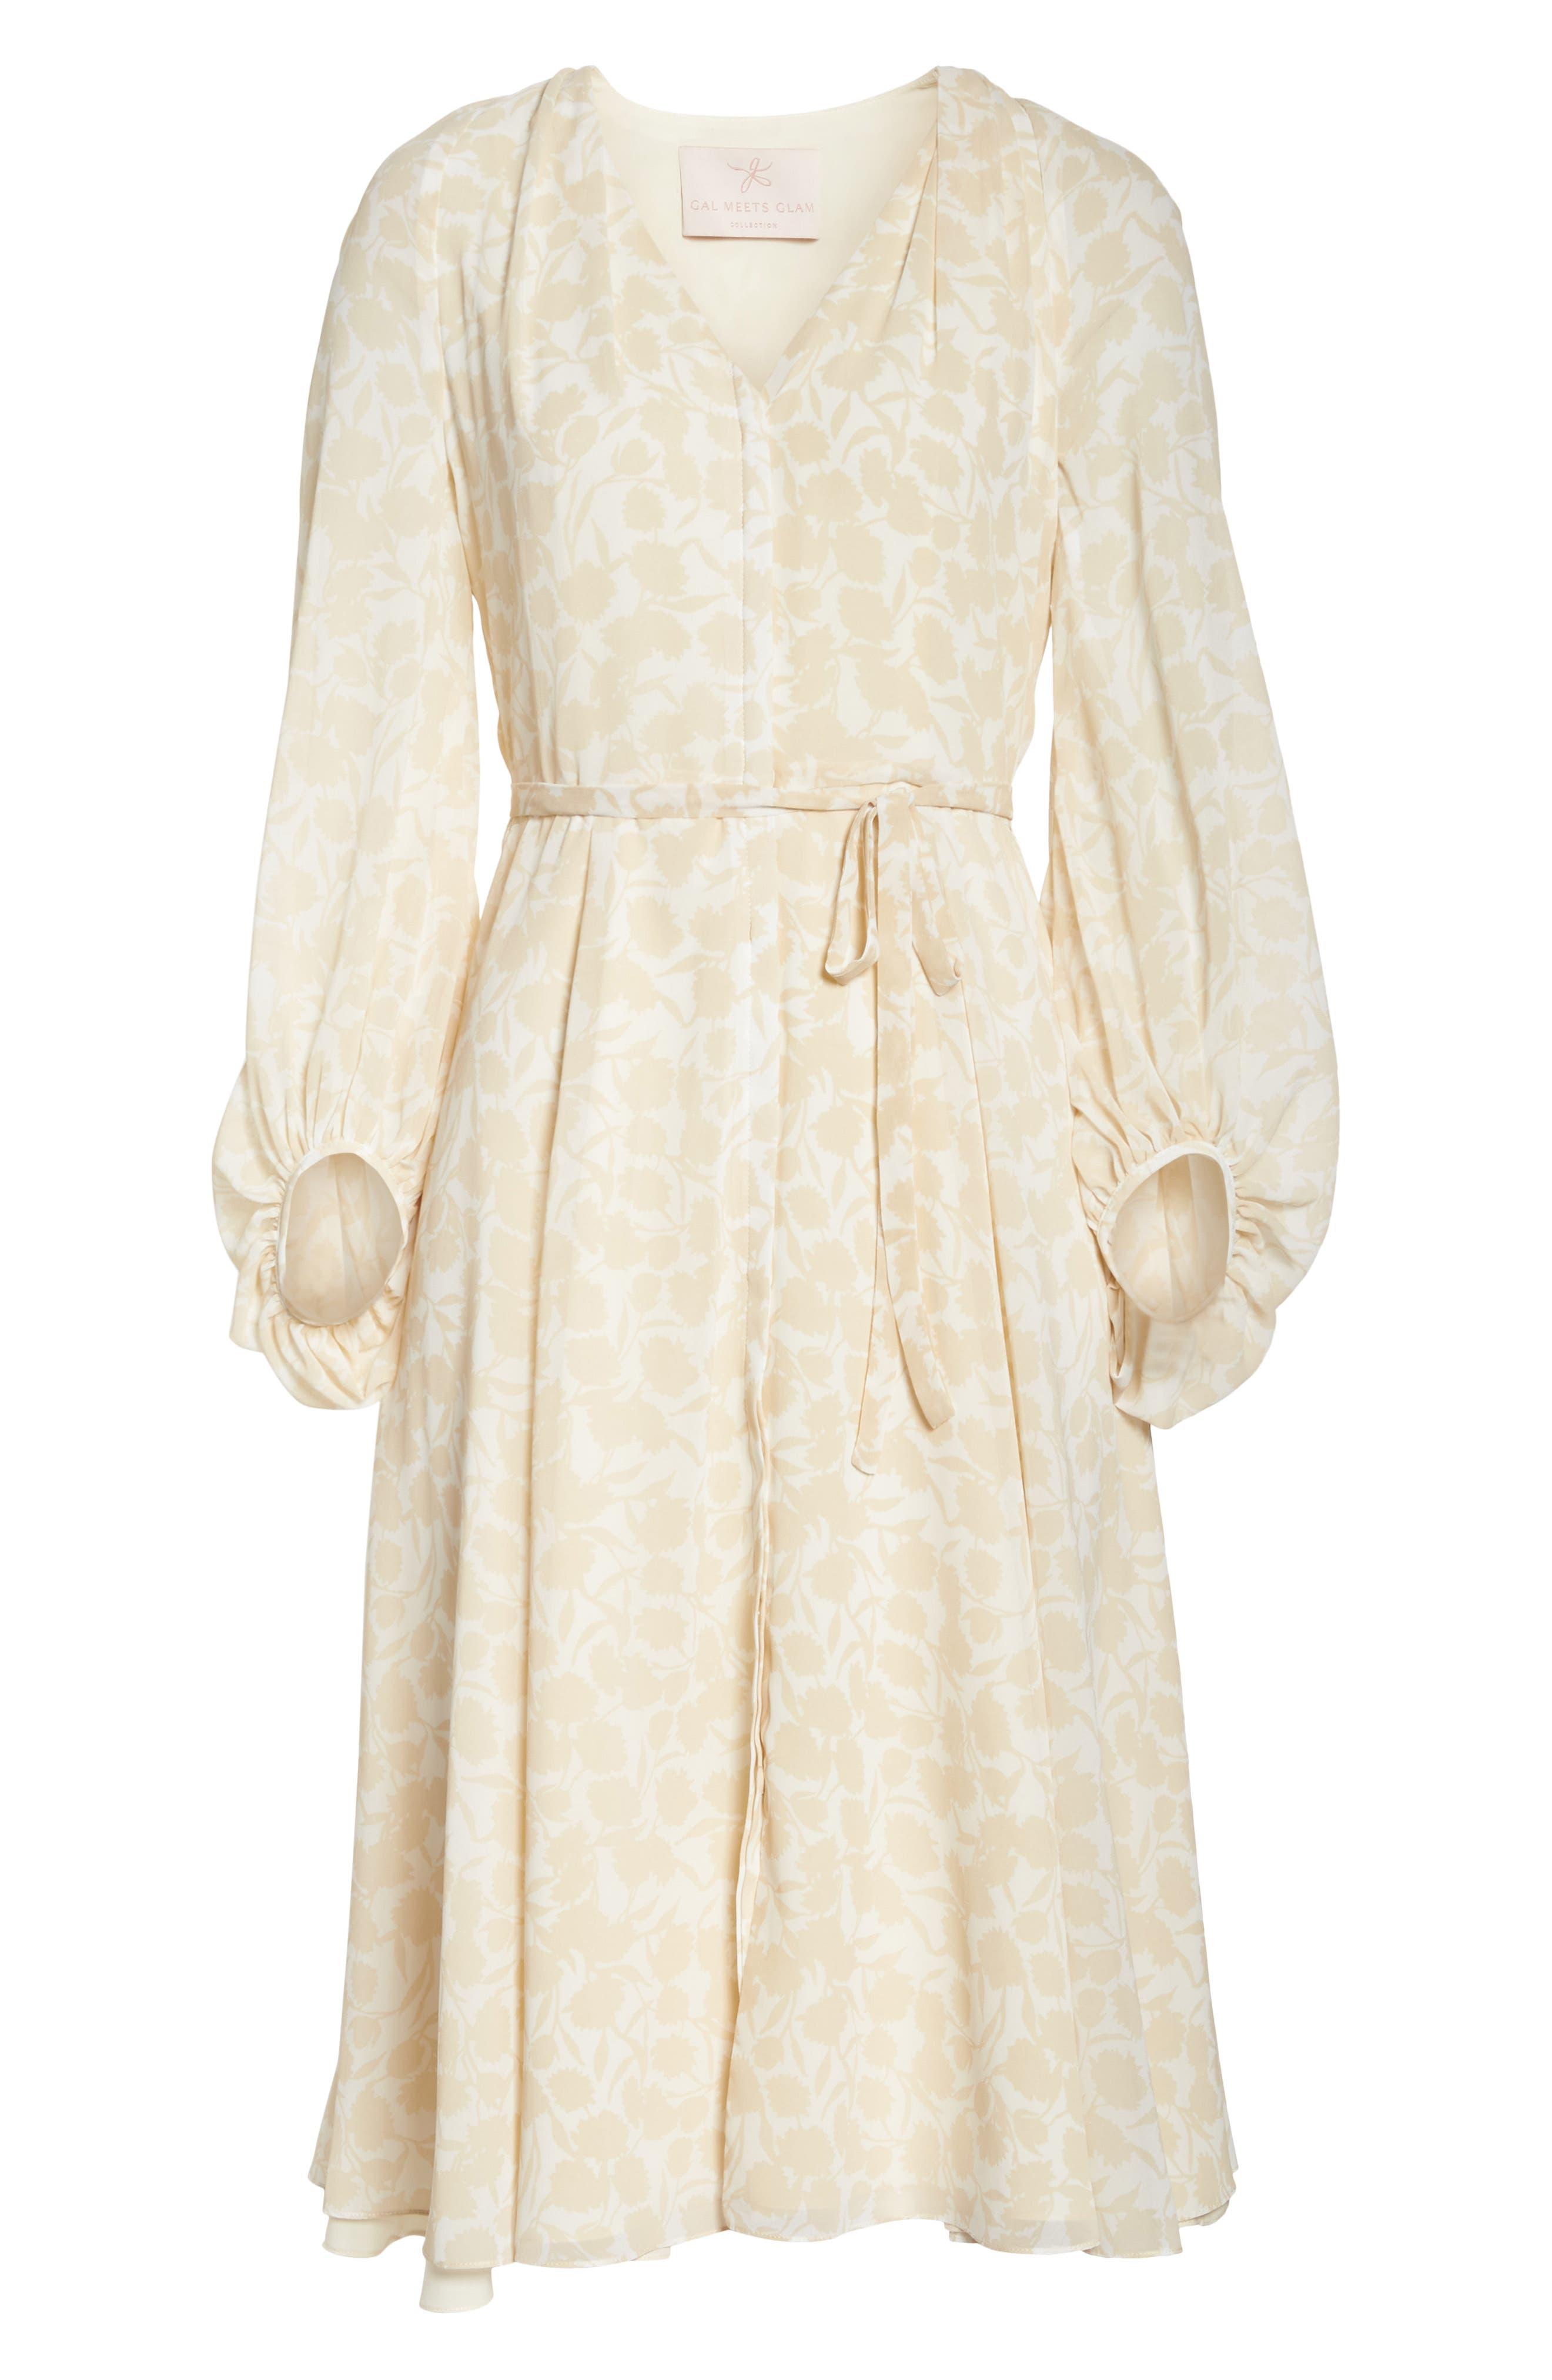 Esther Shadow Branch Chiffon Dress,                             Alternate thumbnail 8, color,                             Cream Combo